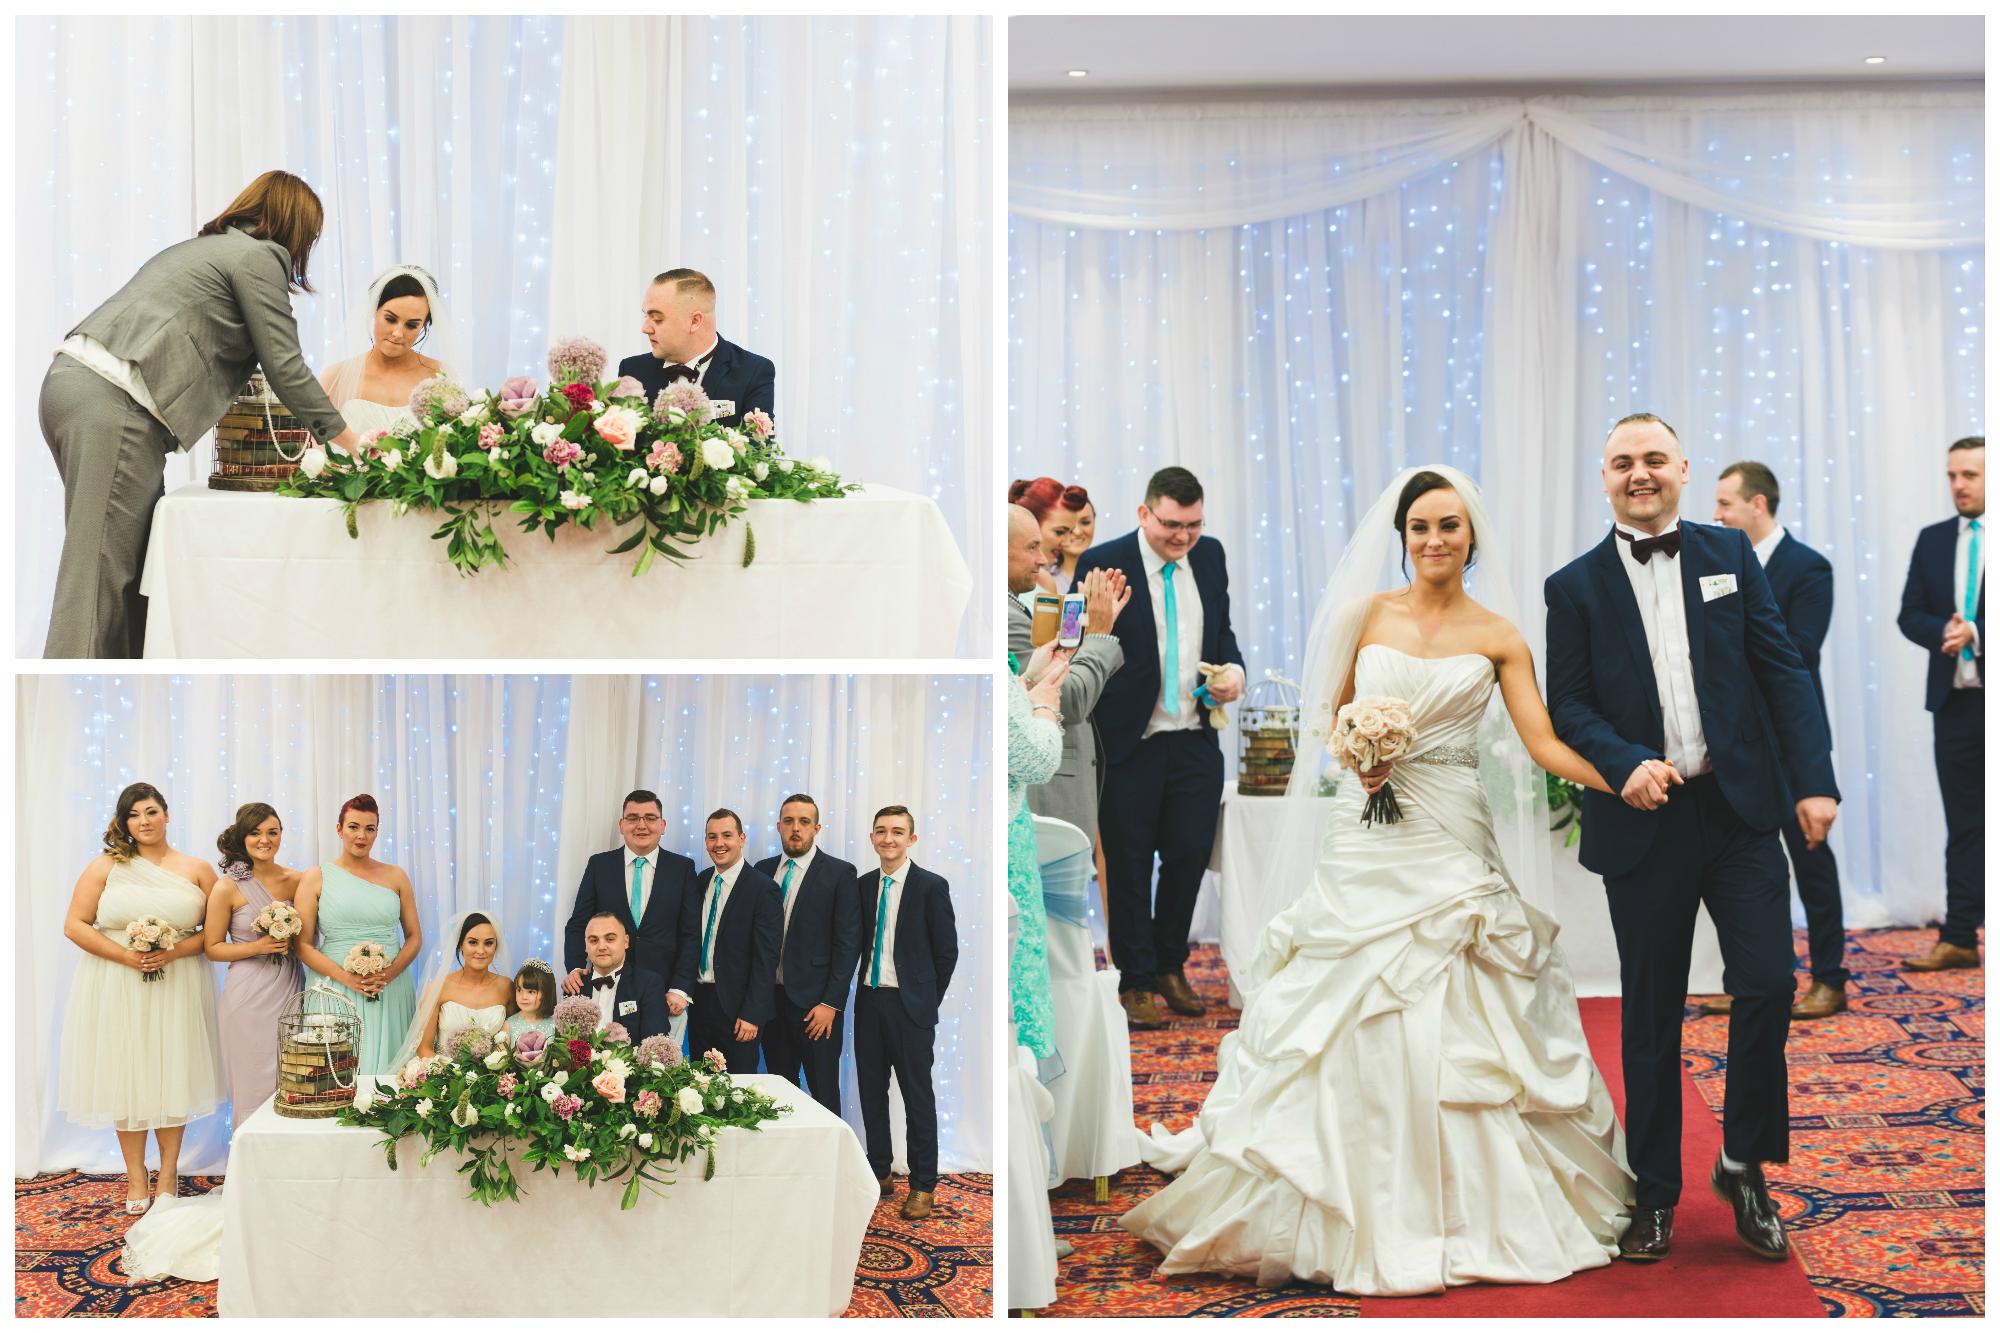 Northern_Ireland_Wedding_Photographer_Purephotoni_Dunsilly_Hotel_Wedding_Signing.jpg